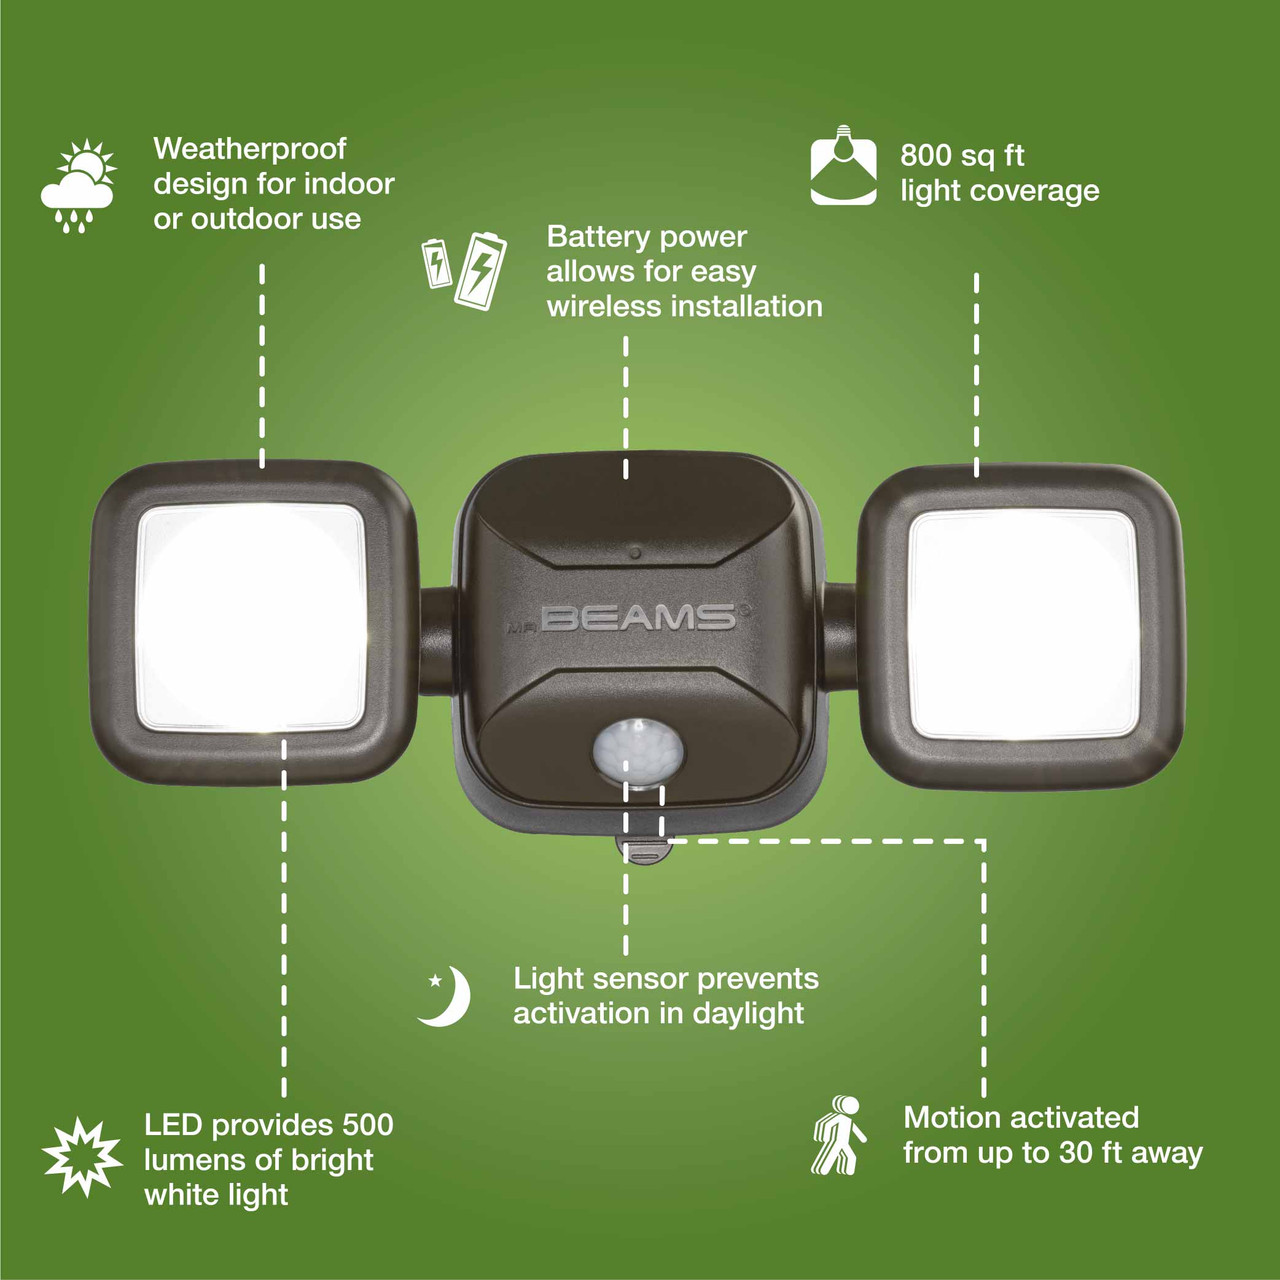 Mr Beams High Performance Motion Sensor Security Light 4 D battery LED WHITE